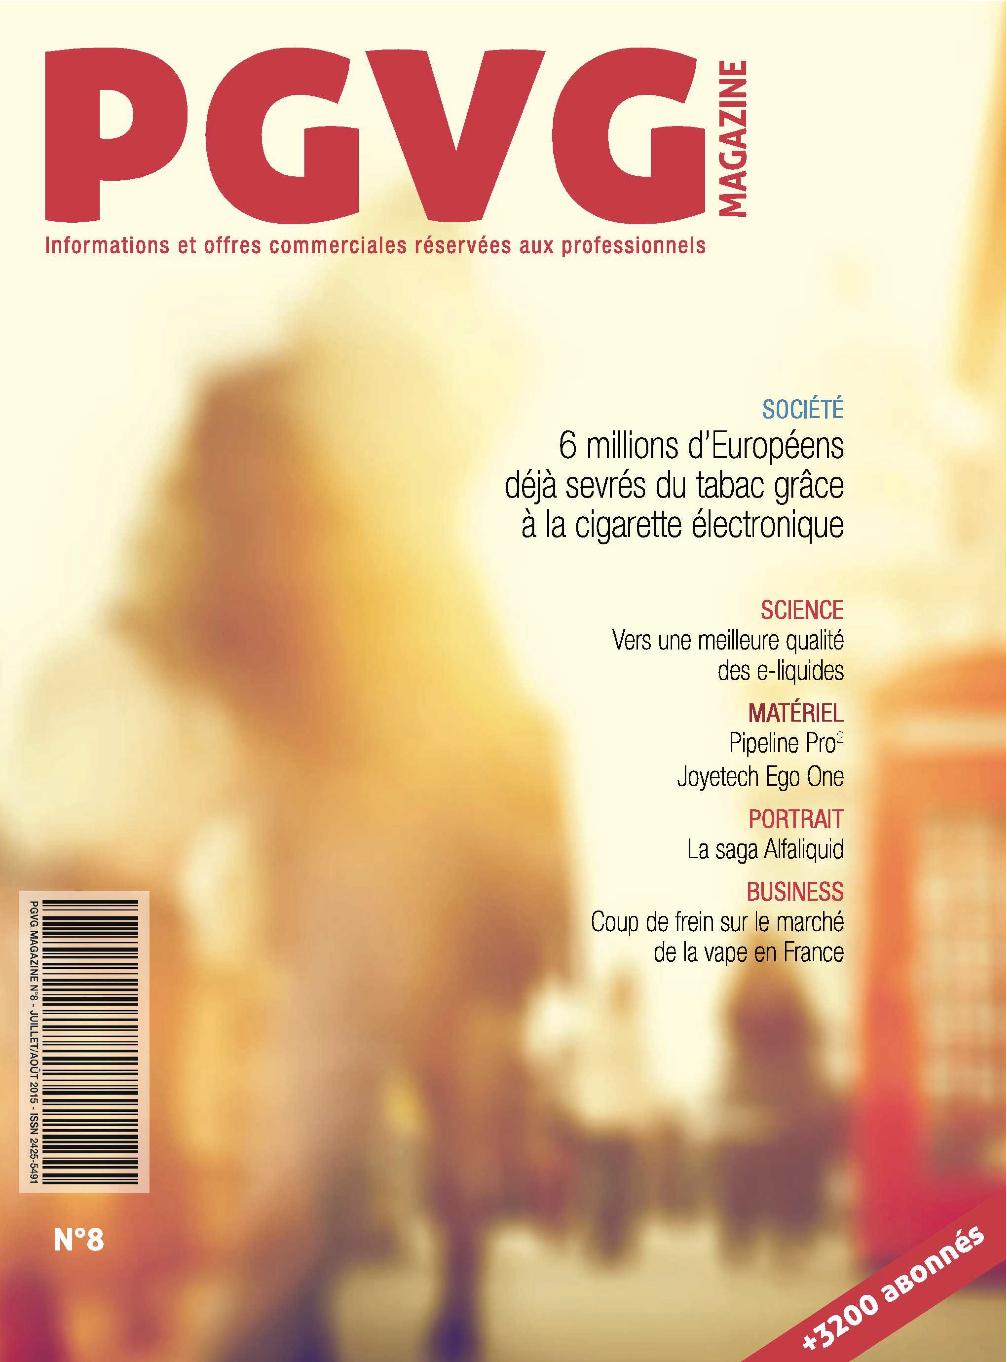 PGVG magazine n.8